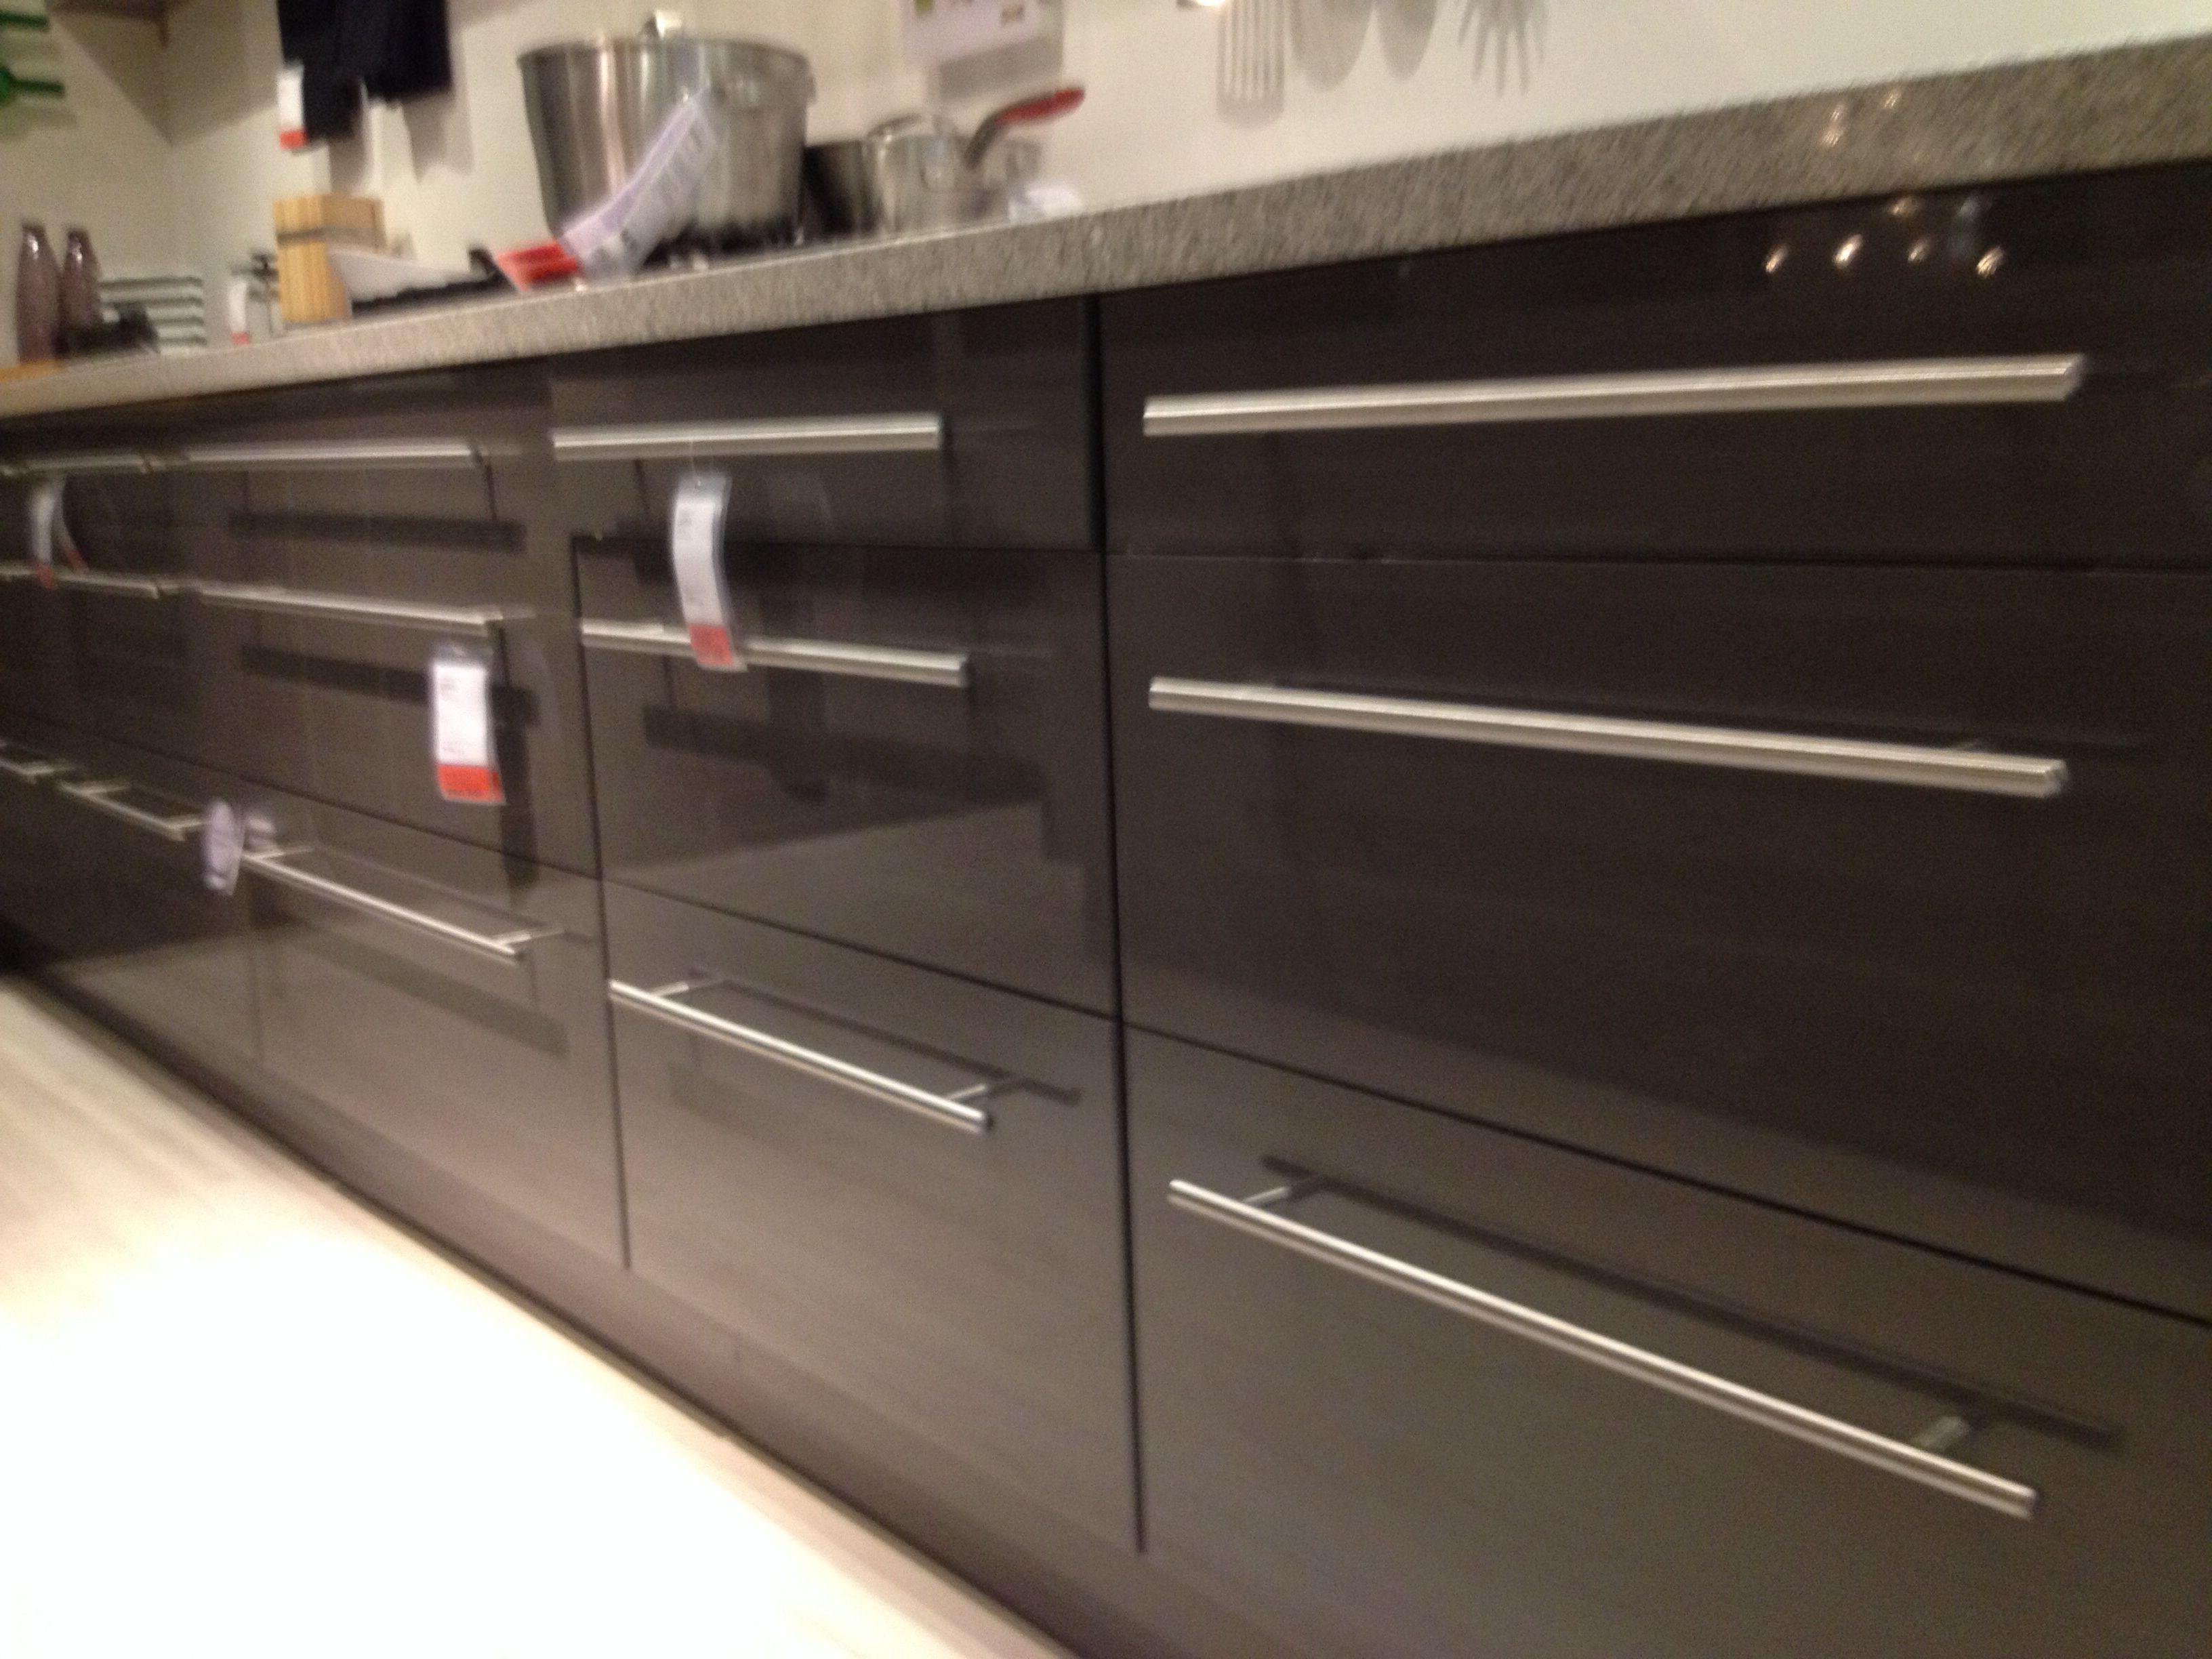 Keuken Grijs Ikea : Ikea keuken grijs hoogglans abstract Keuken Pinterest